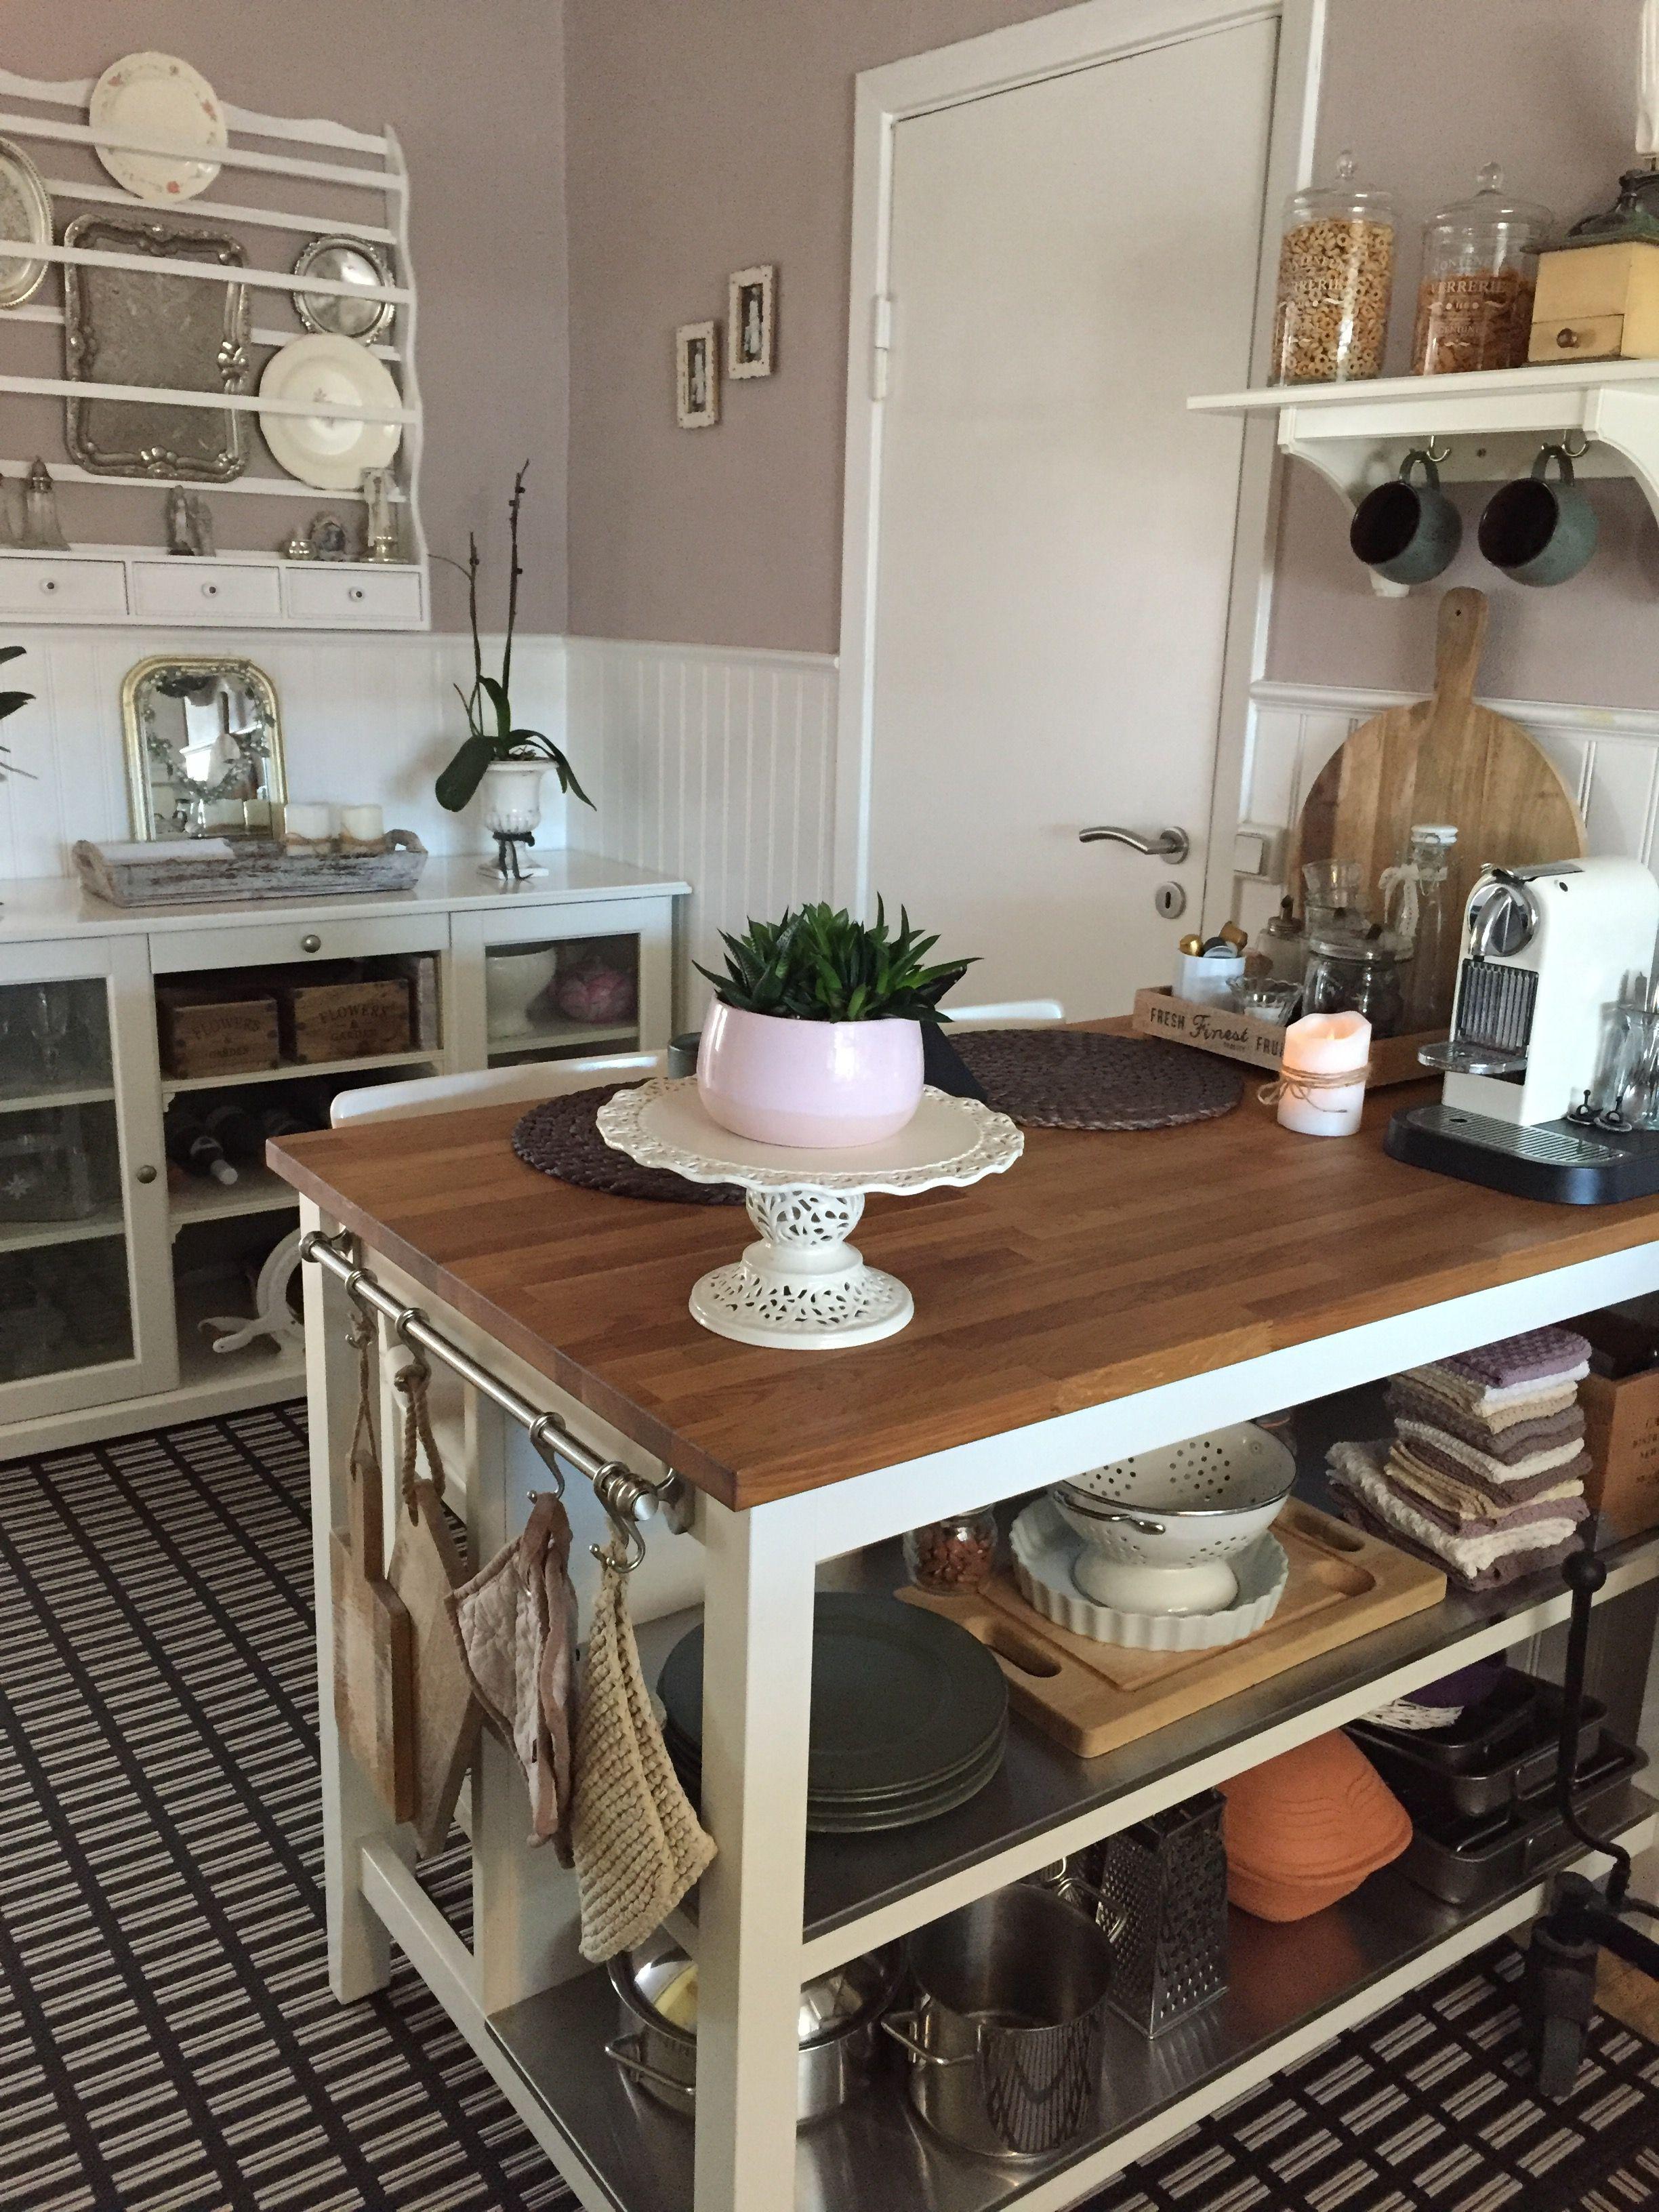 Stenstorp kitchen Island  adding hooks for towelsmitts